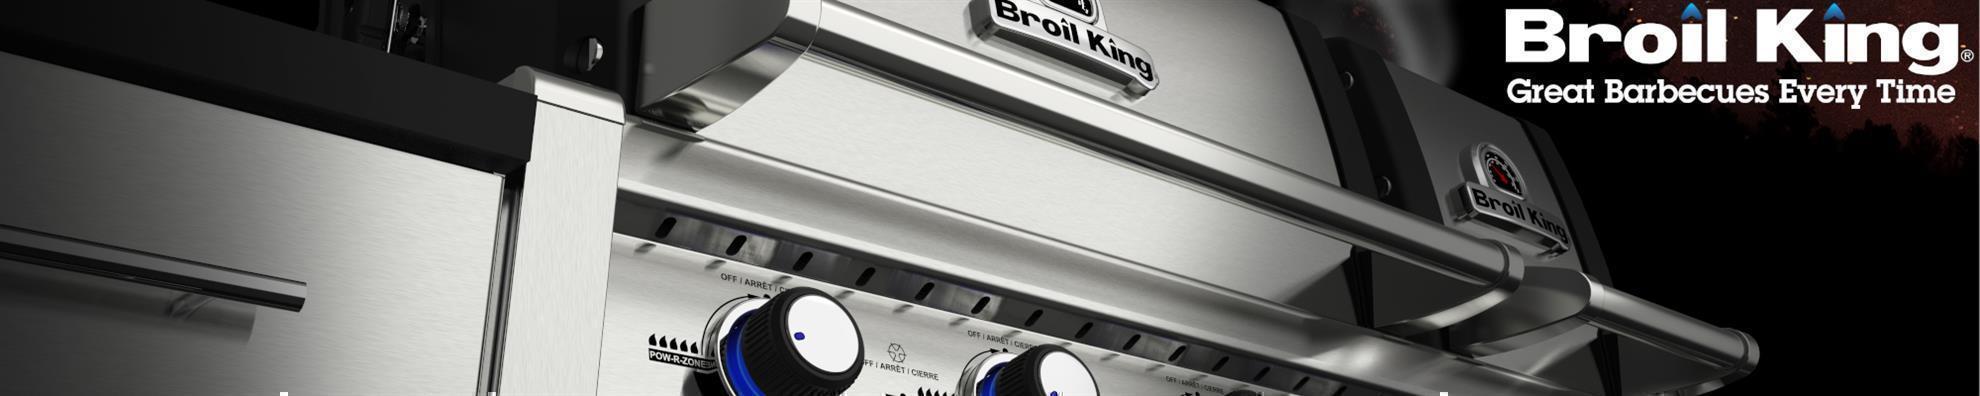 Broil King - IMPERIAL™ S 570 BUILT IN